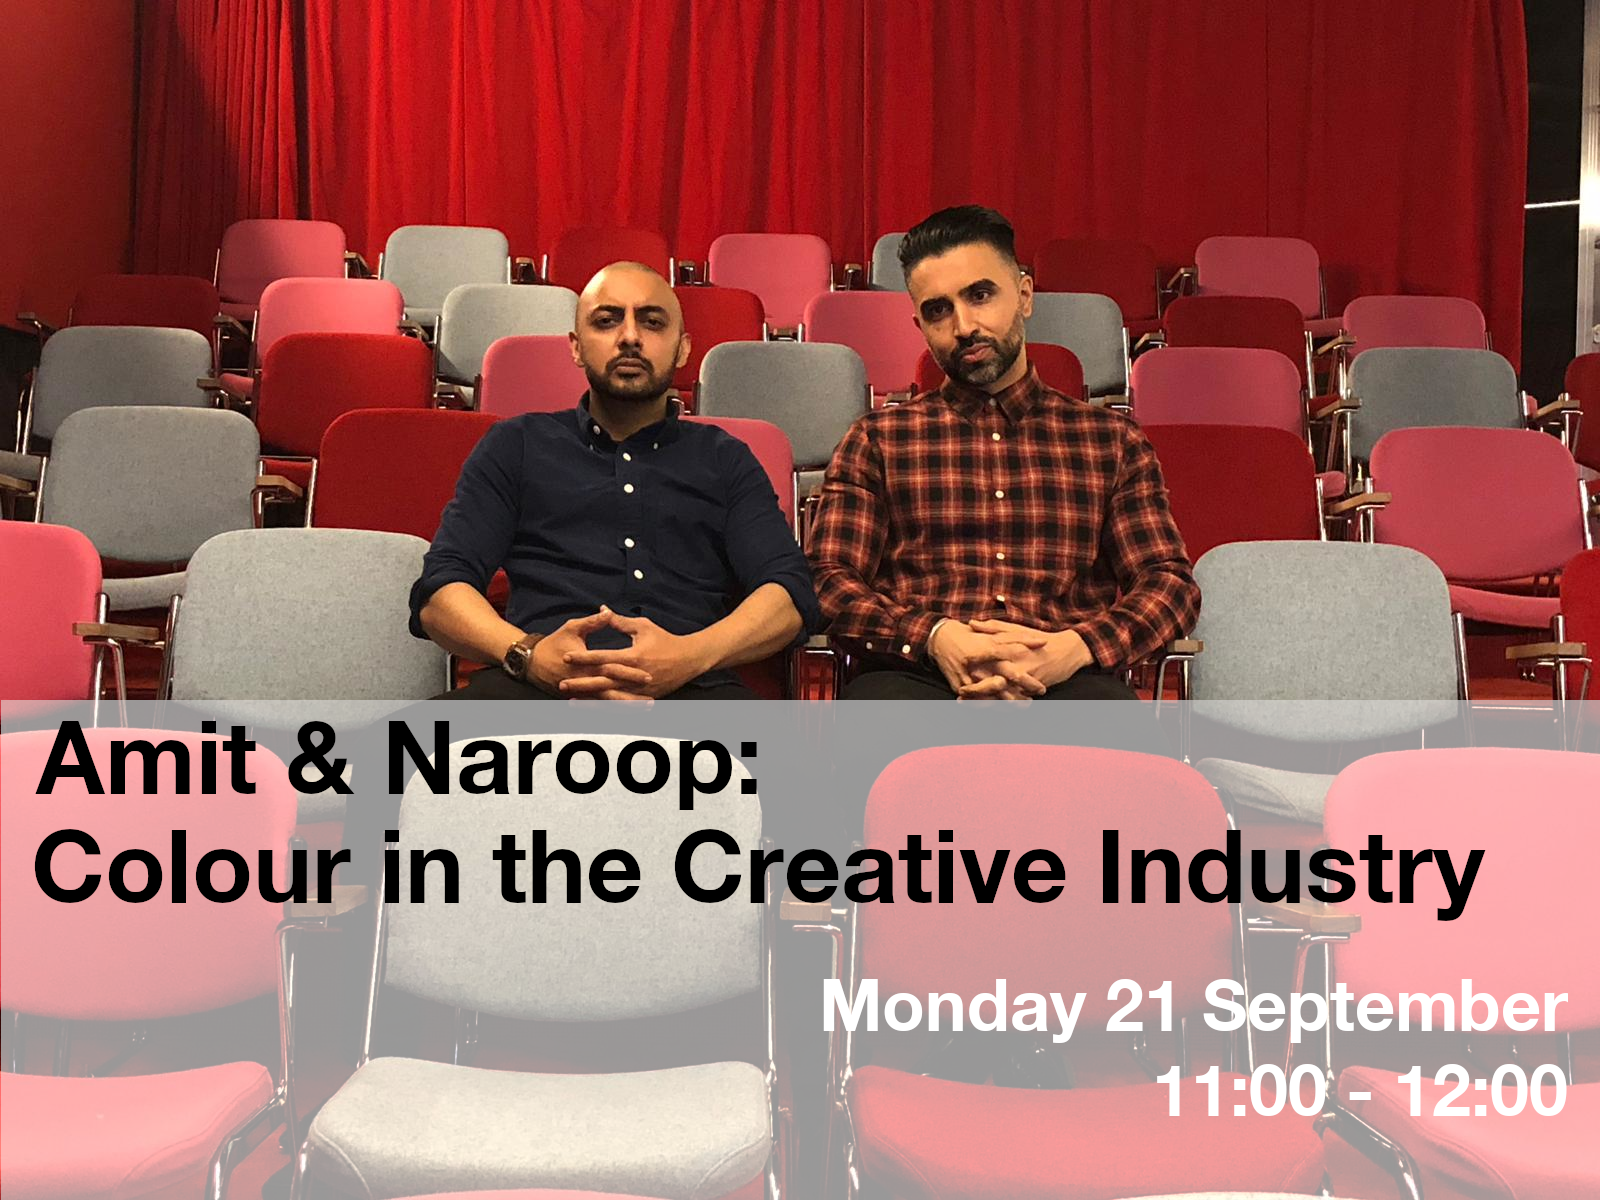 Amit & Naroop in Conversation